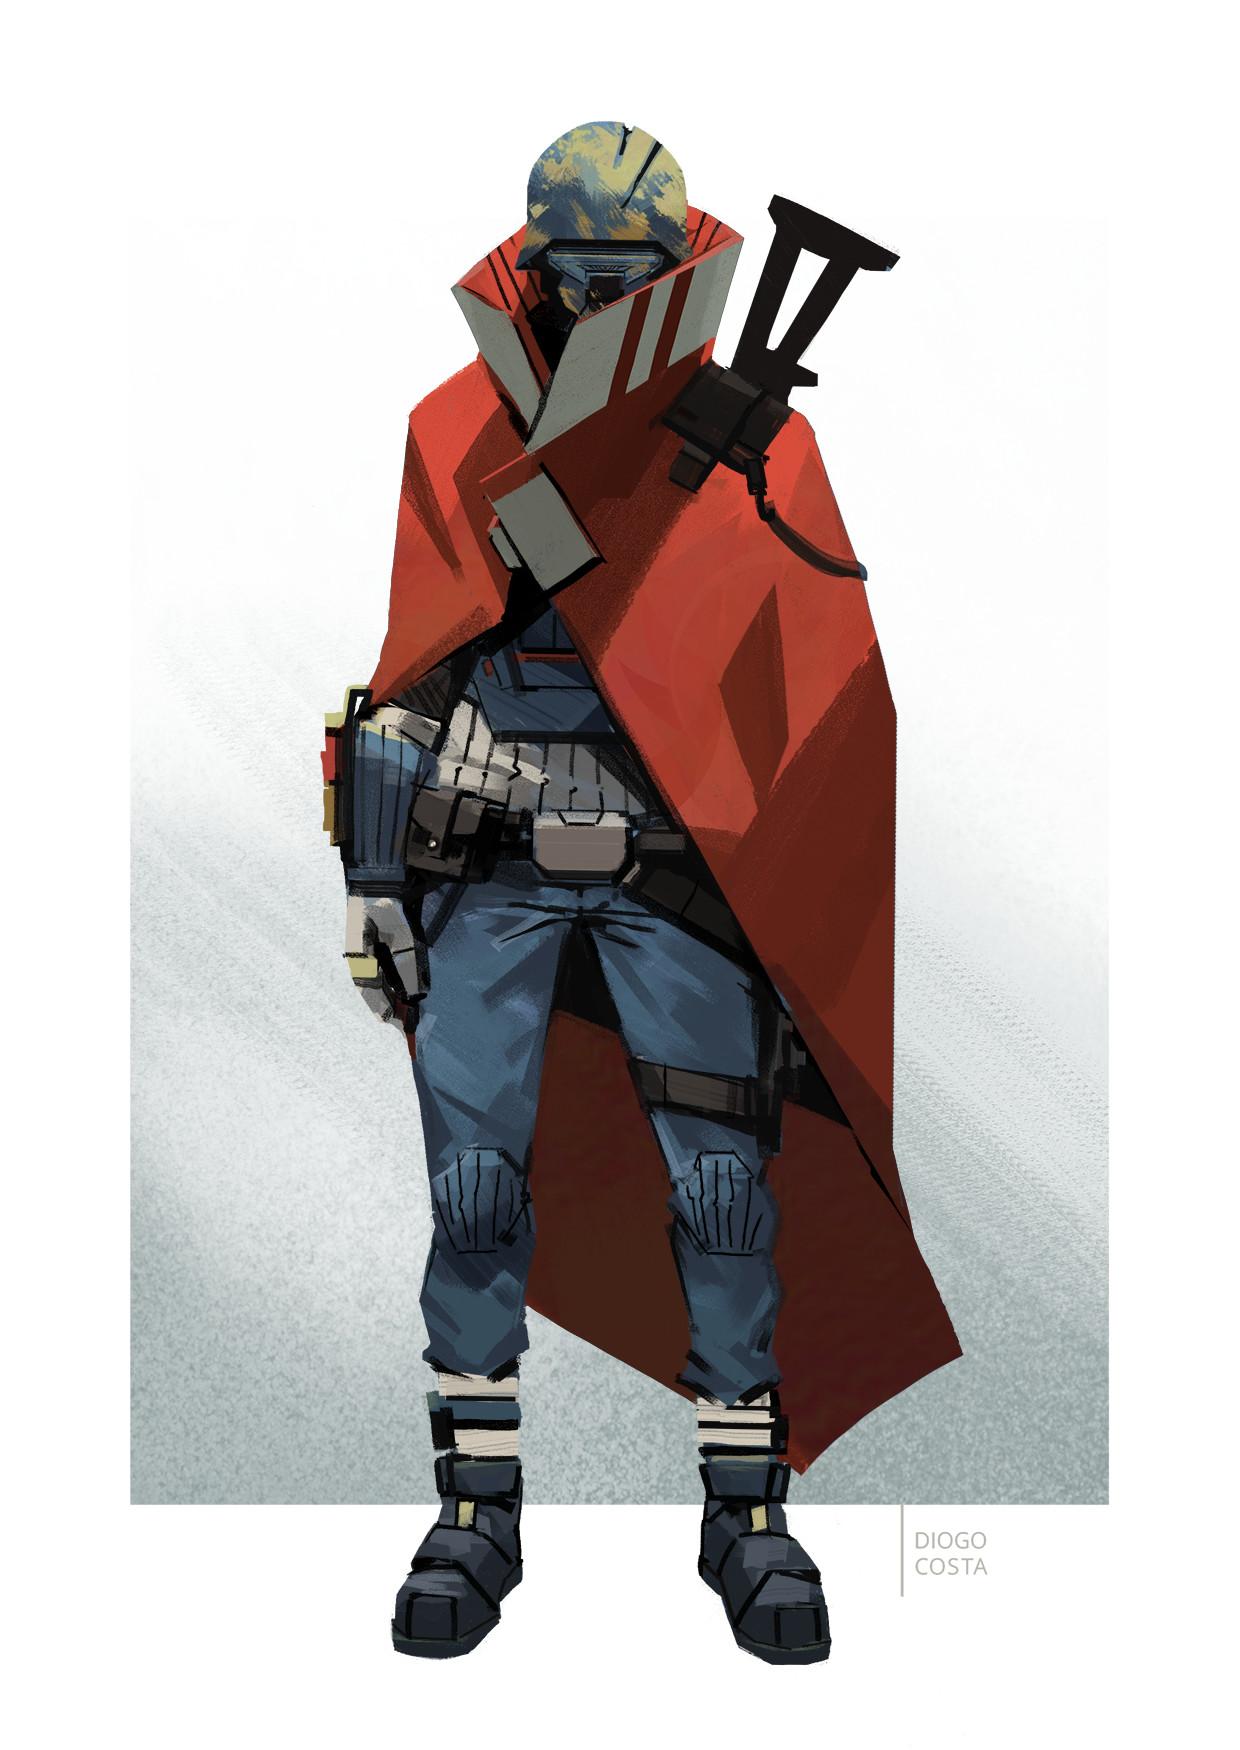 Diogo costa bounty hunter 2